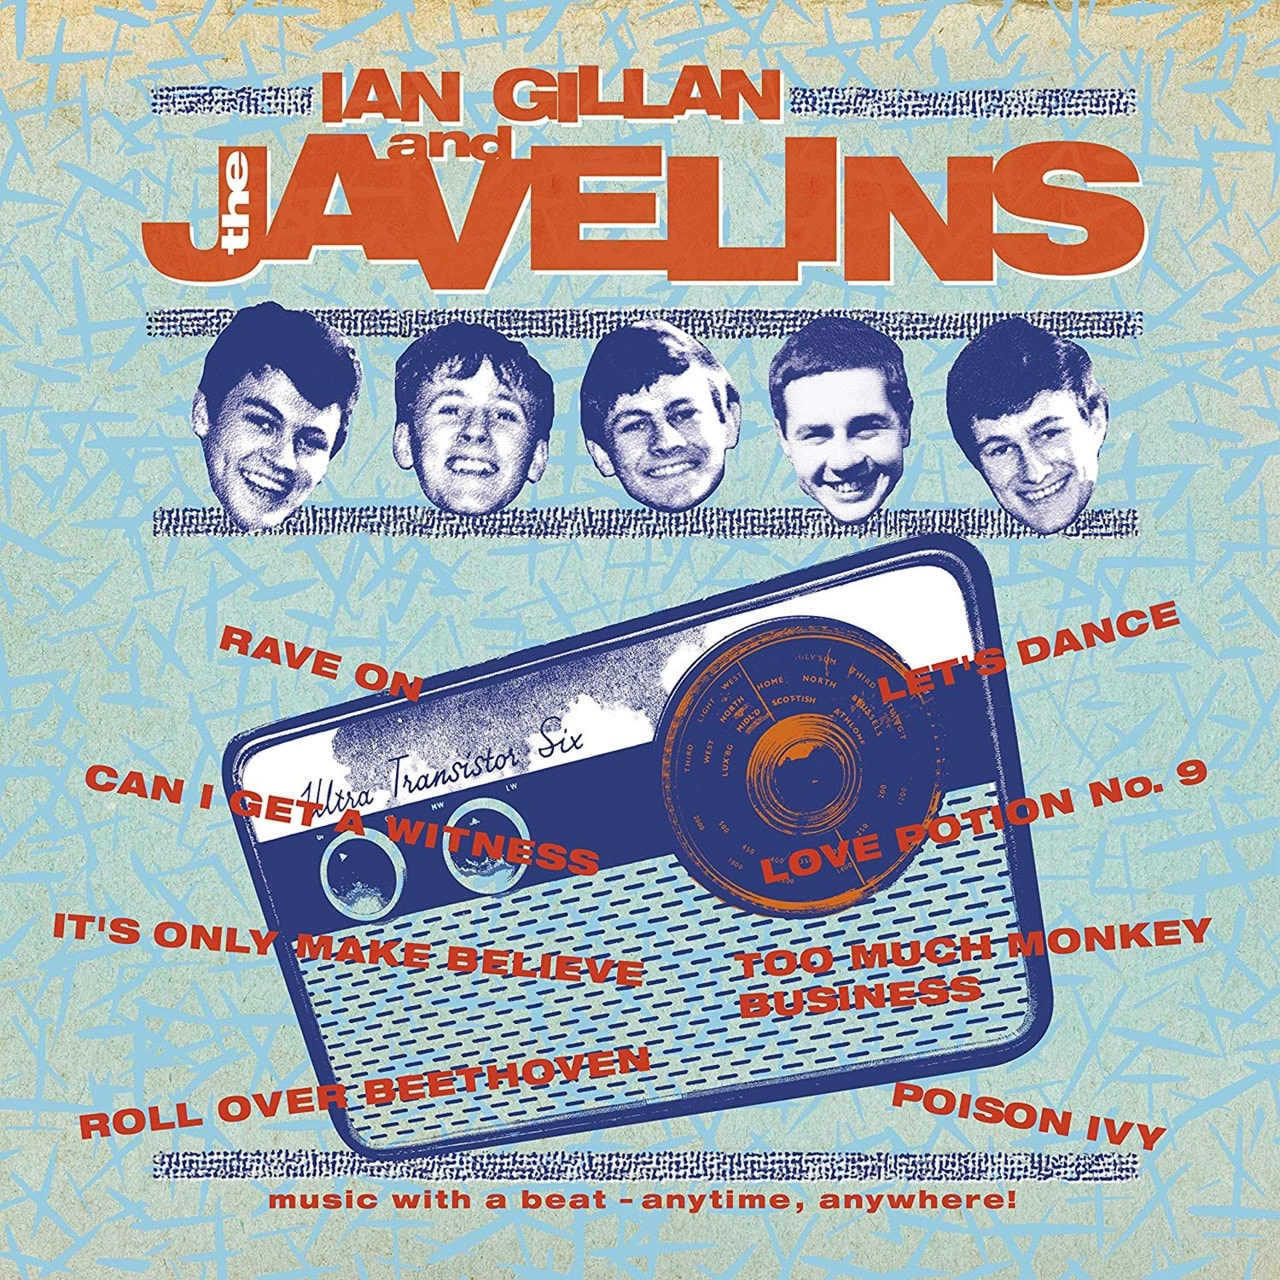 Raving With Ian Gillan & the Javelins - 1